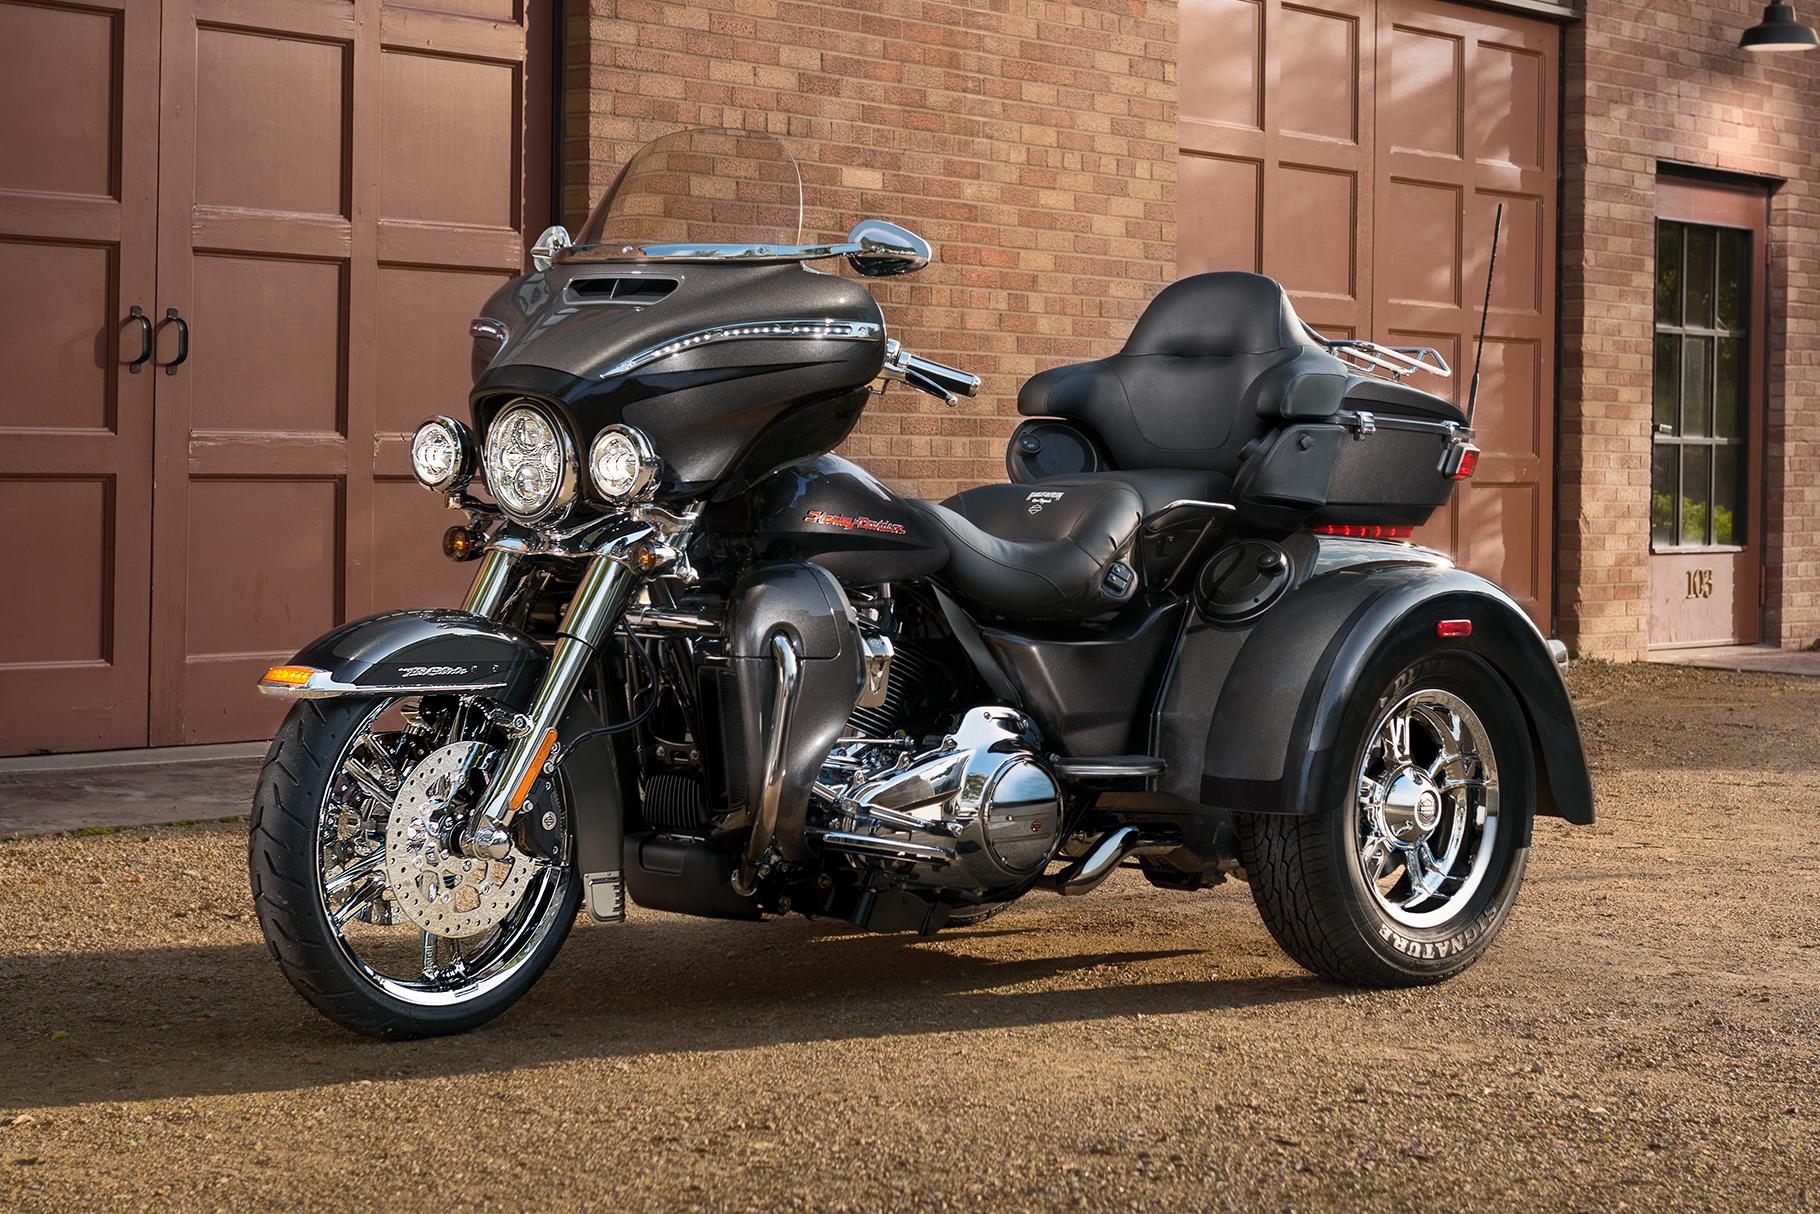 2016 Harley Davidson Trike Tri Glide Ultra Review: 2019 Tri Glide Ultra Motorcycle